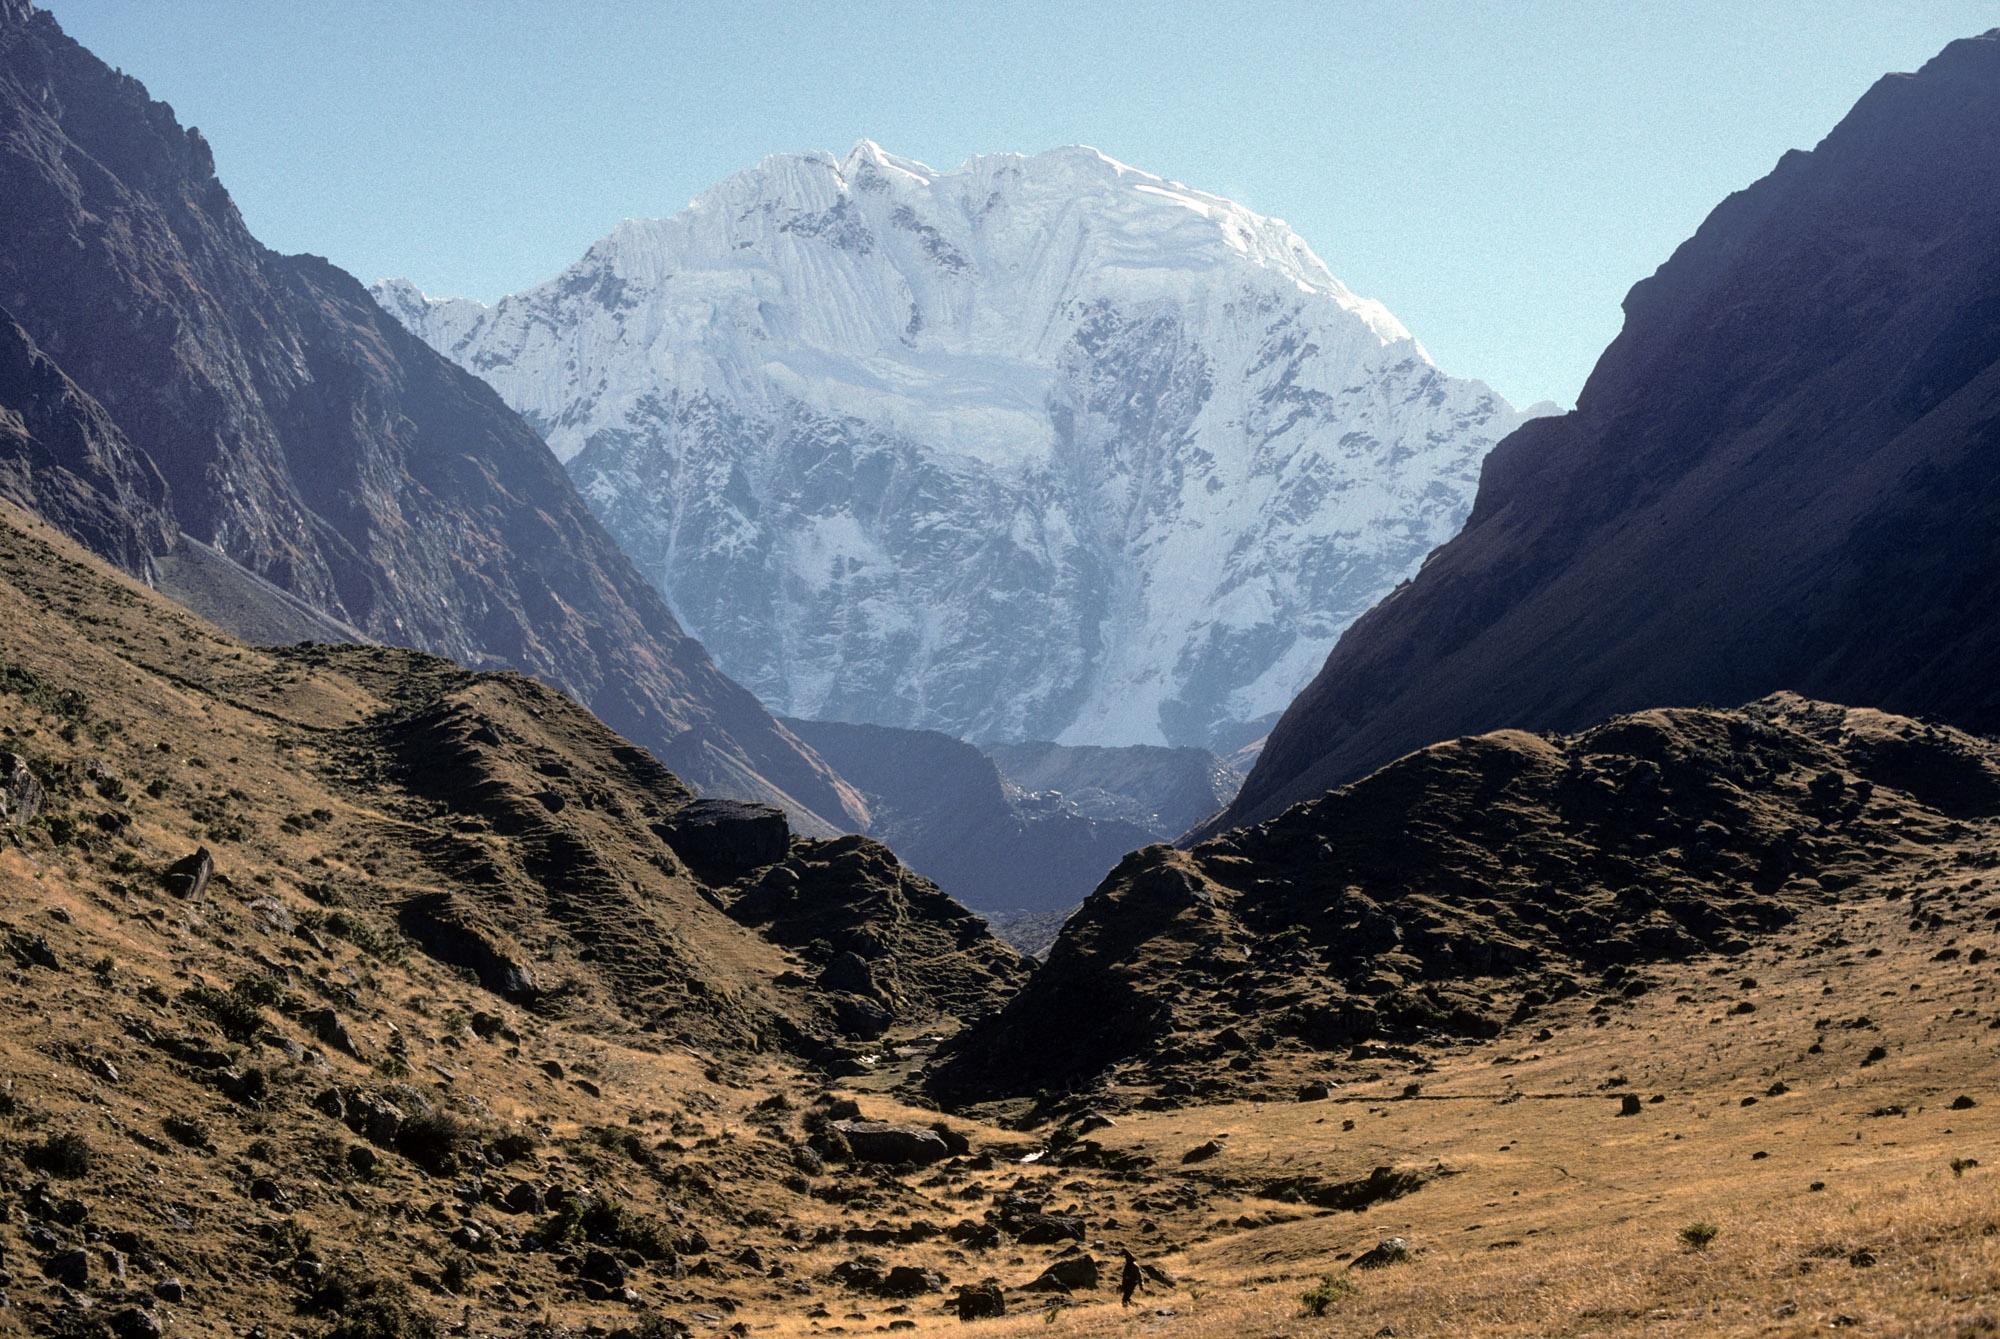 Photo of the Rio Blanco Valley, Peru.